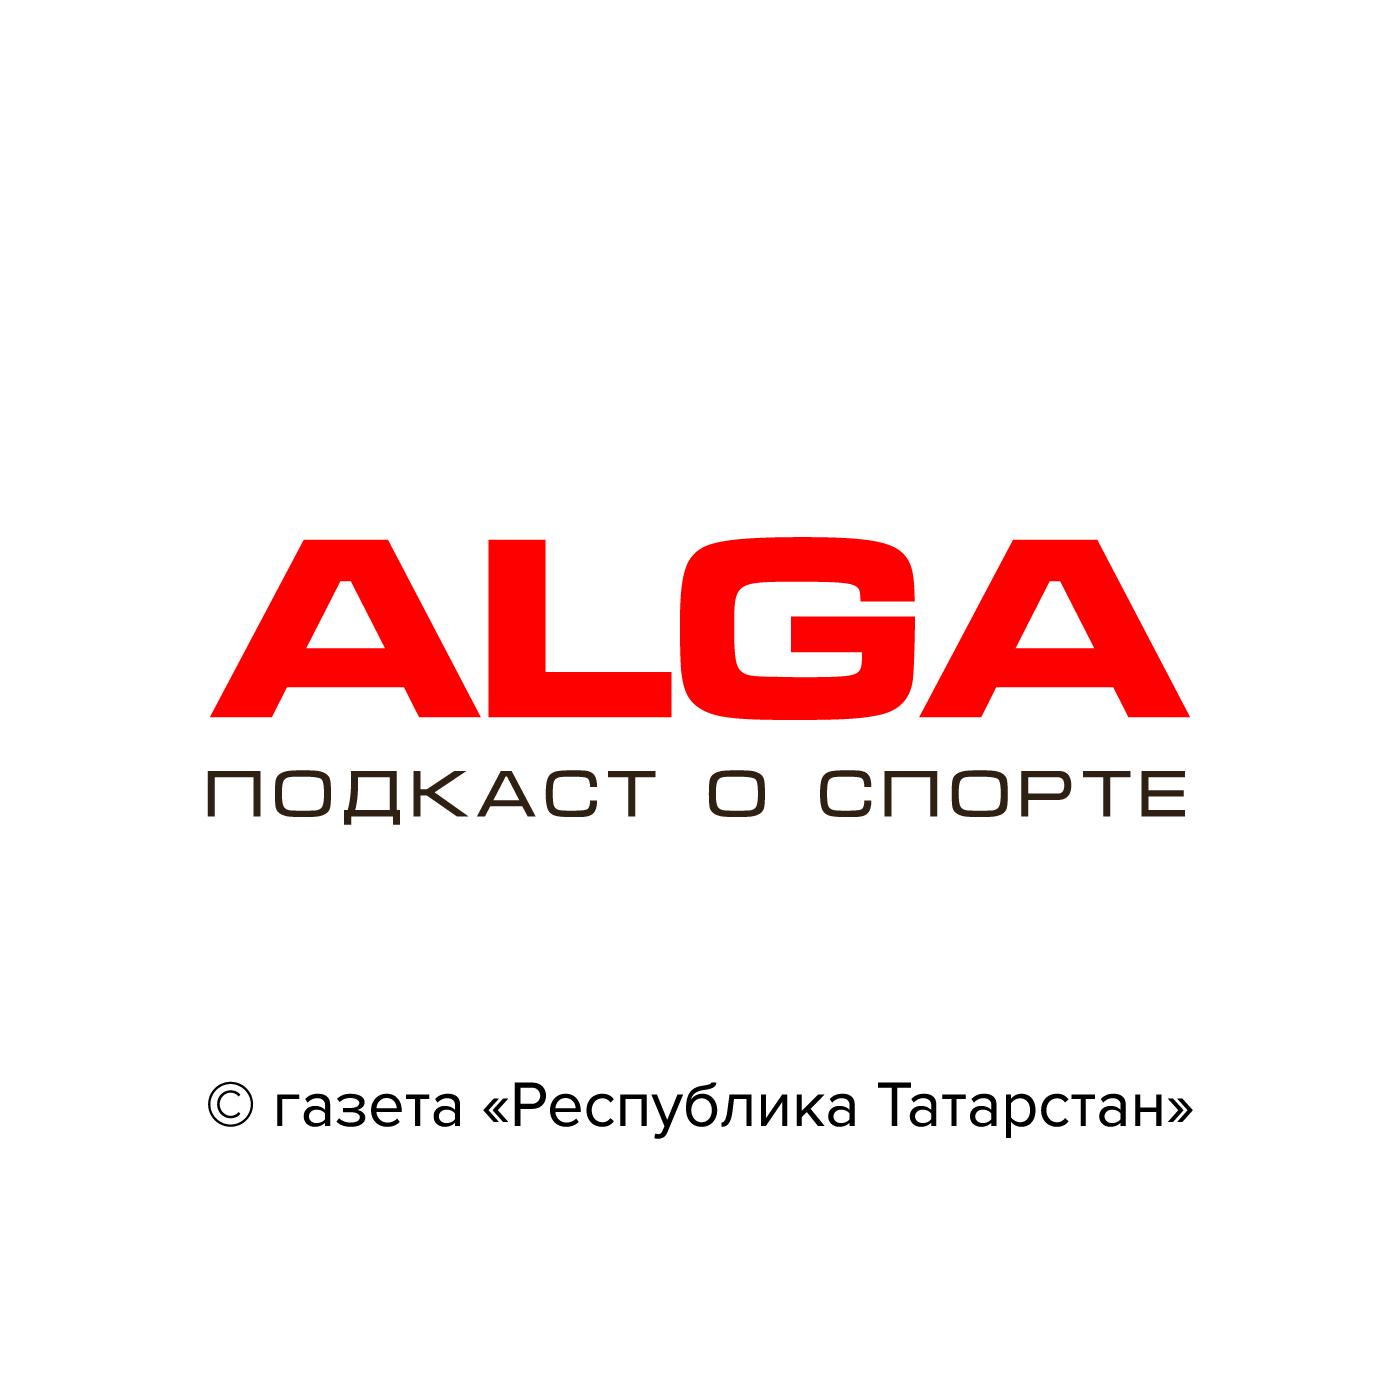 ALGA оригинал